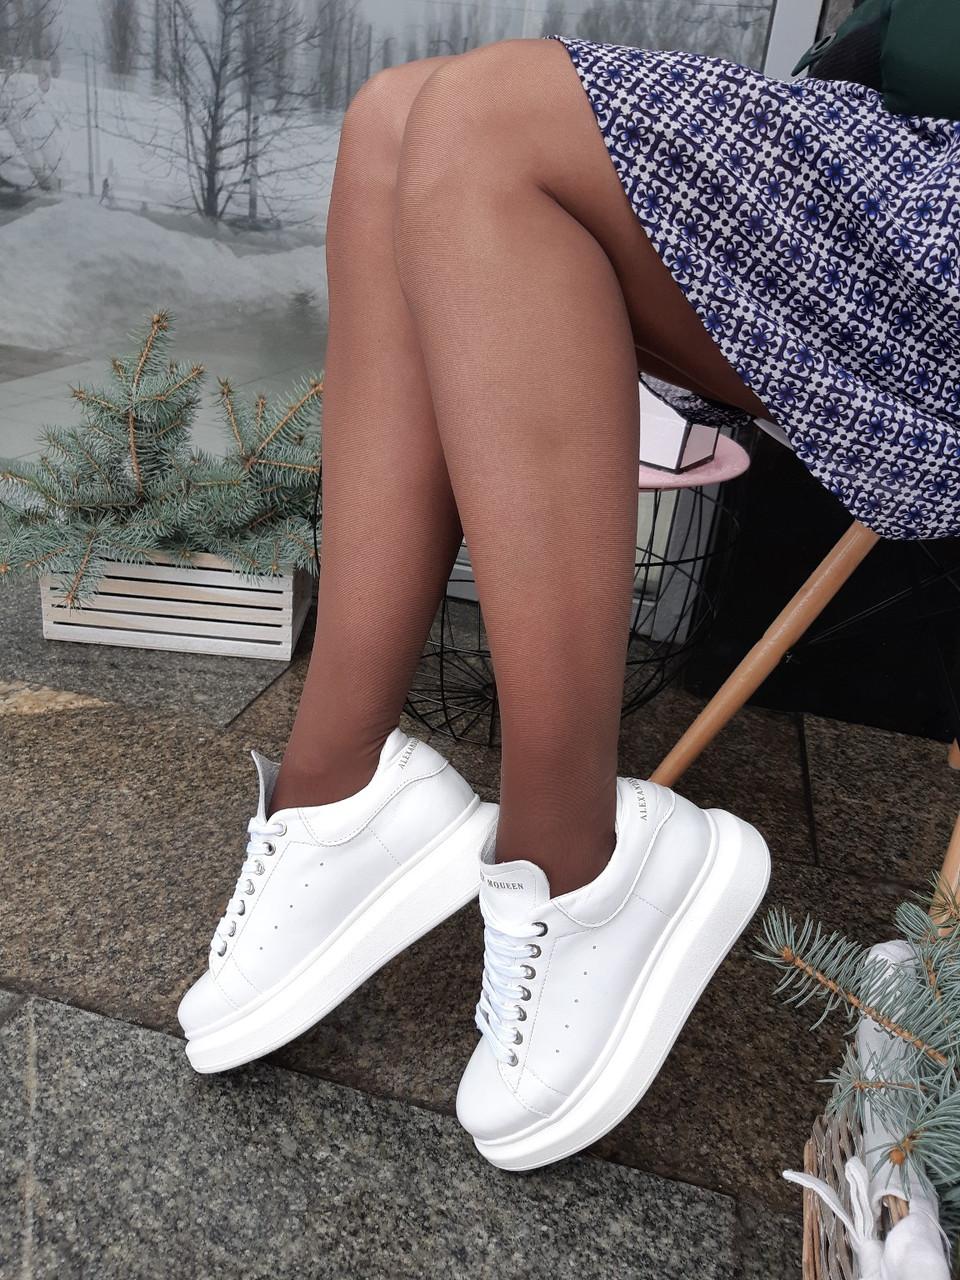 8bafdd0f8fa3e7 Женские Белые кеды Alexander McQueen на платформе натуральная кожа - ГЛЯНЕЦ  | Интернет-магазин КОЖАНОЙ